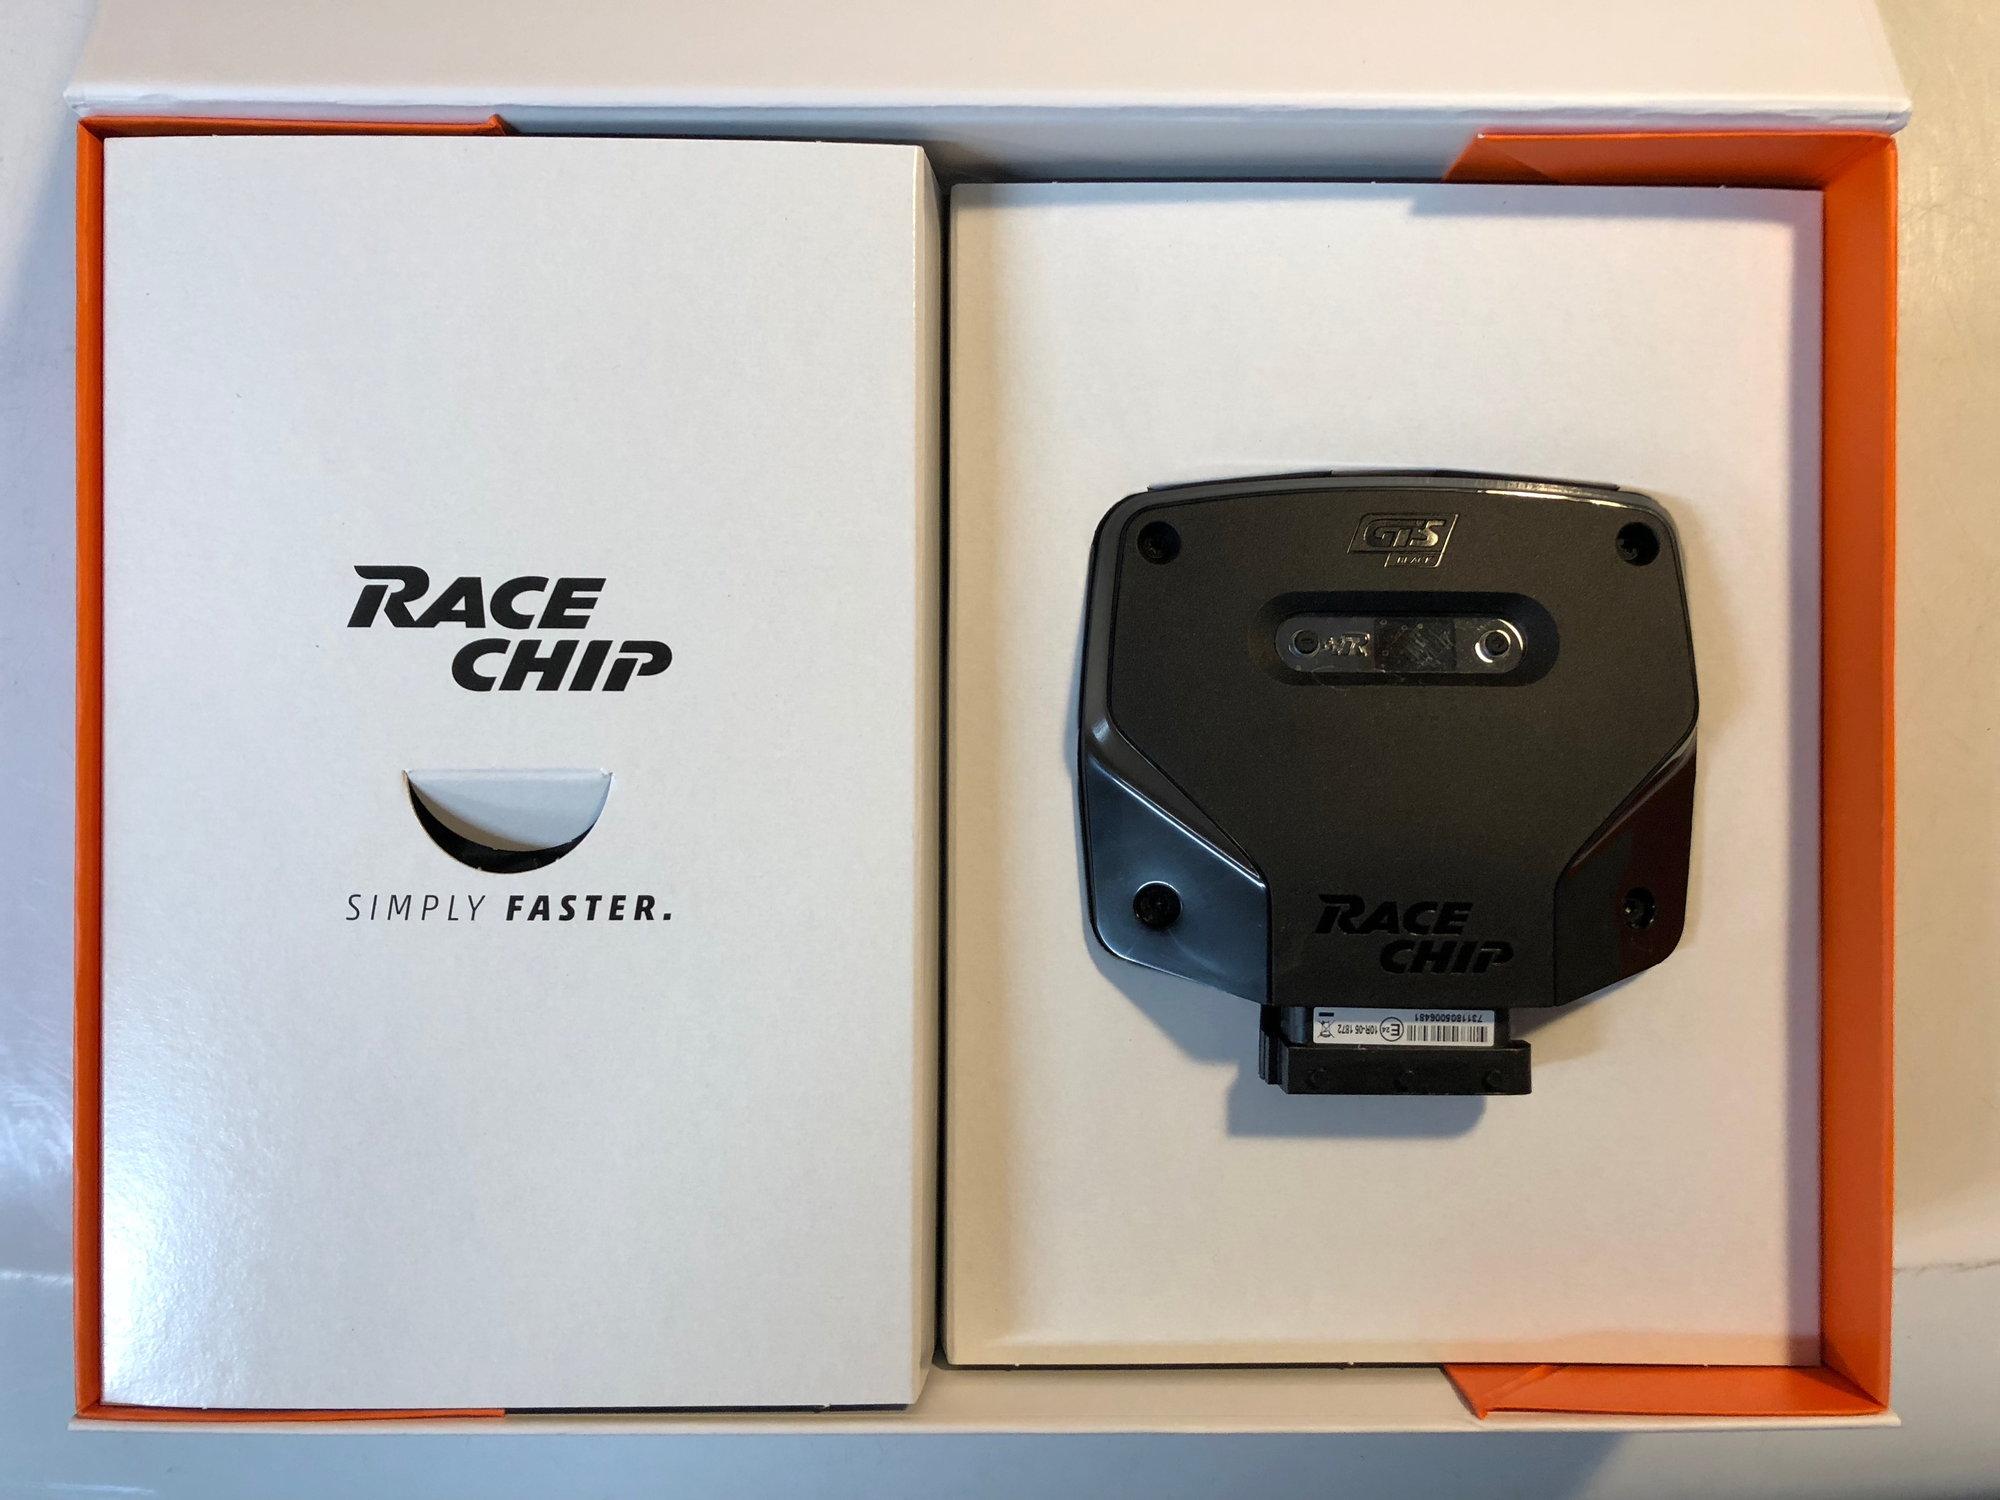 New Race Chip For Sale! - AudiWorld Forums